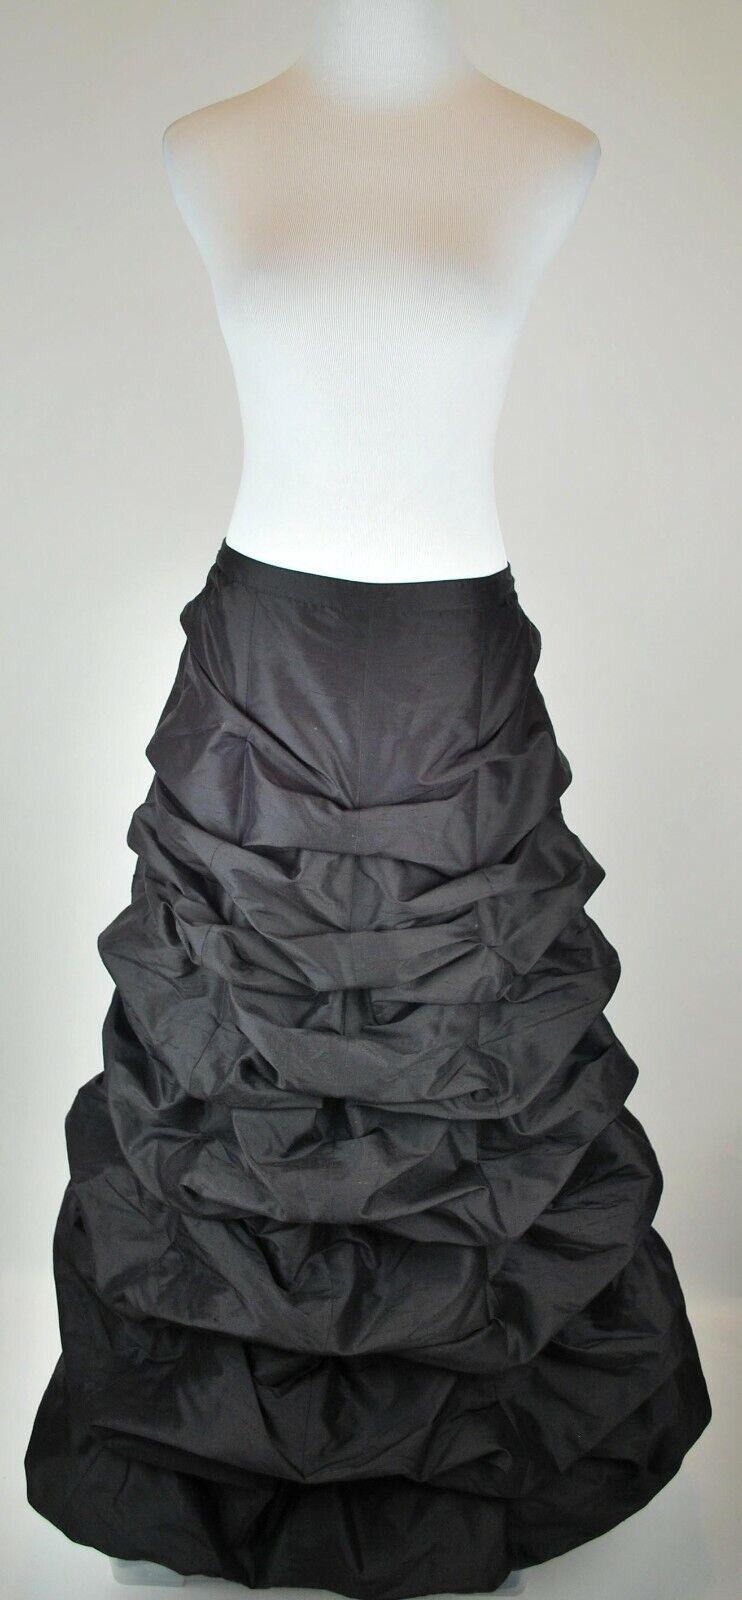 Gothic Balloon Skirt Bustle Gathered Steampunk Vi… - image 1